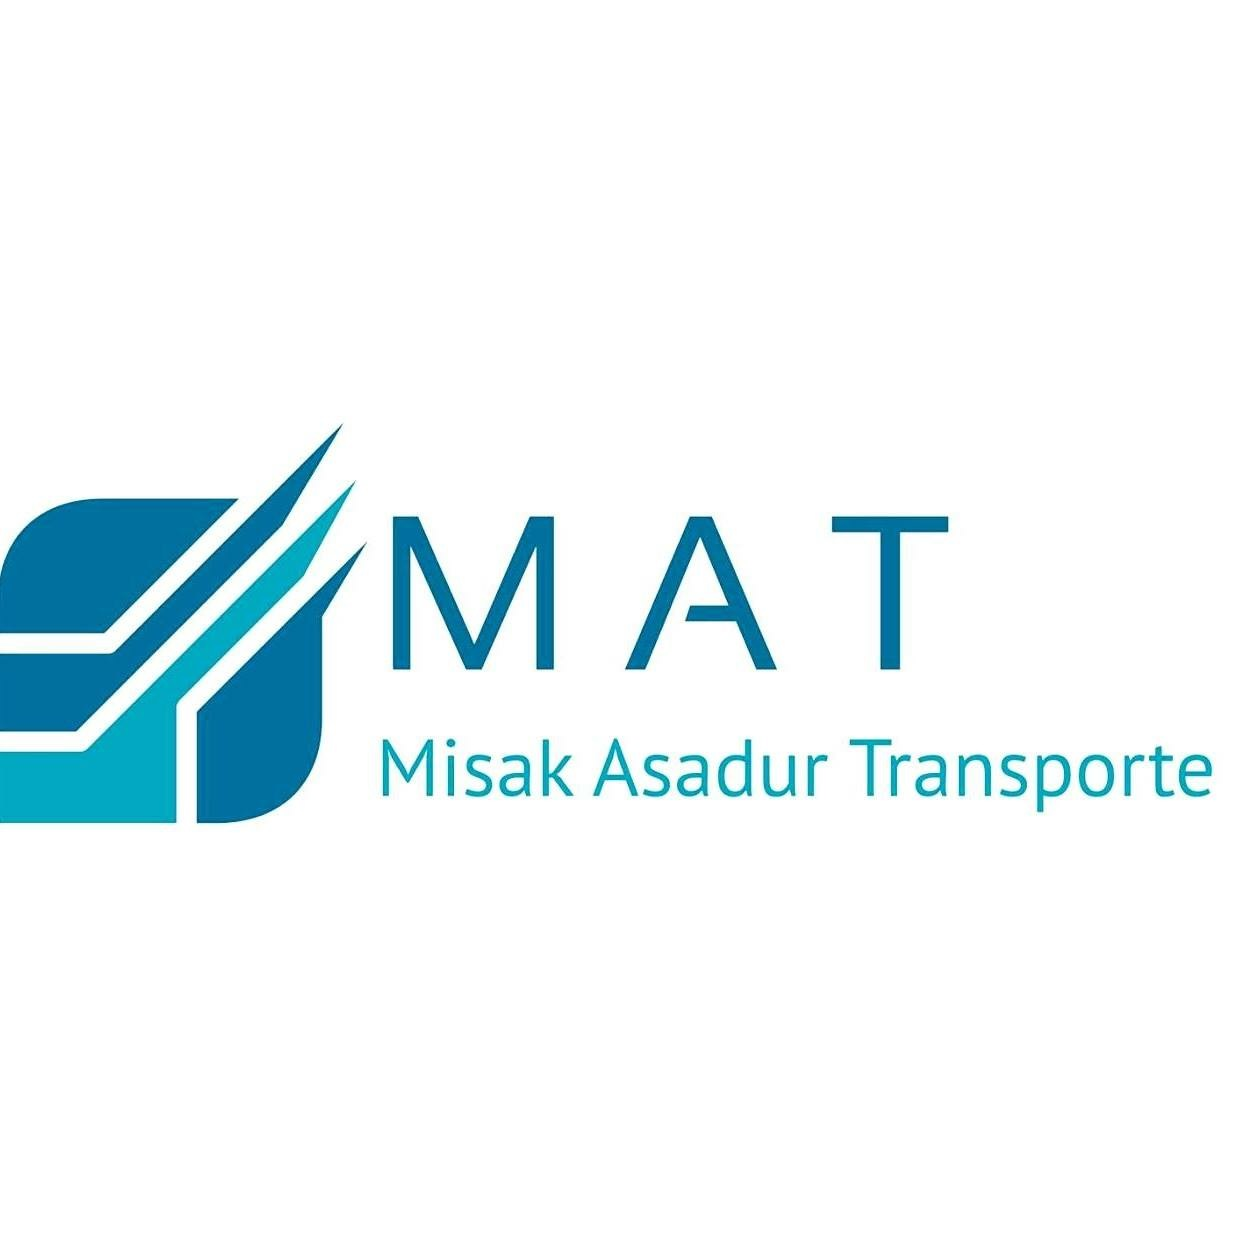 M A T misak asadur transporte